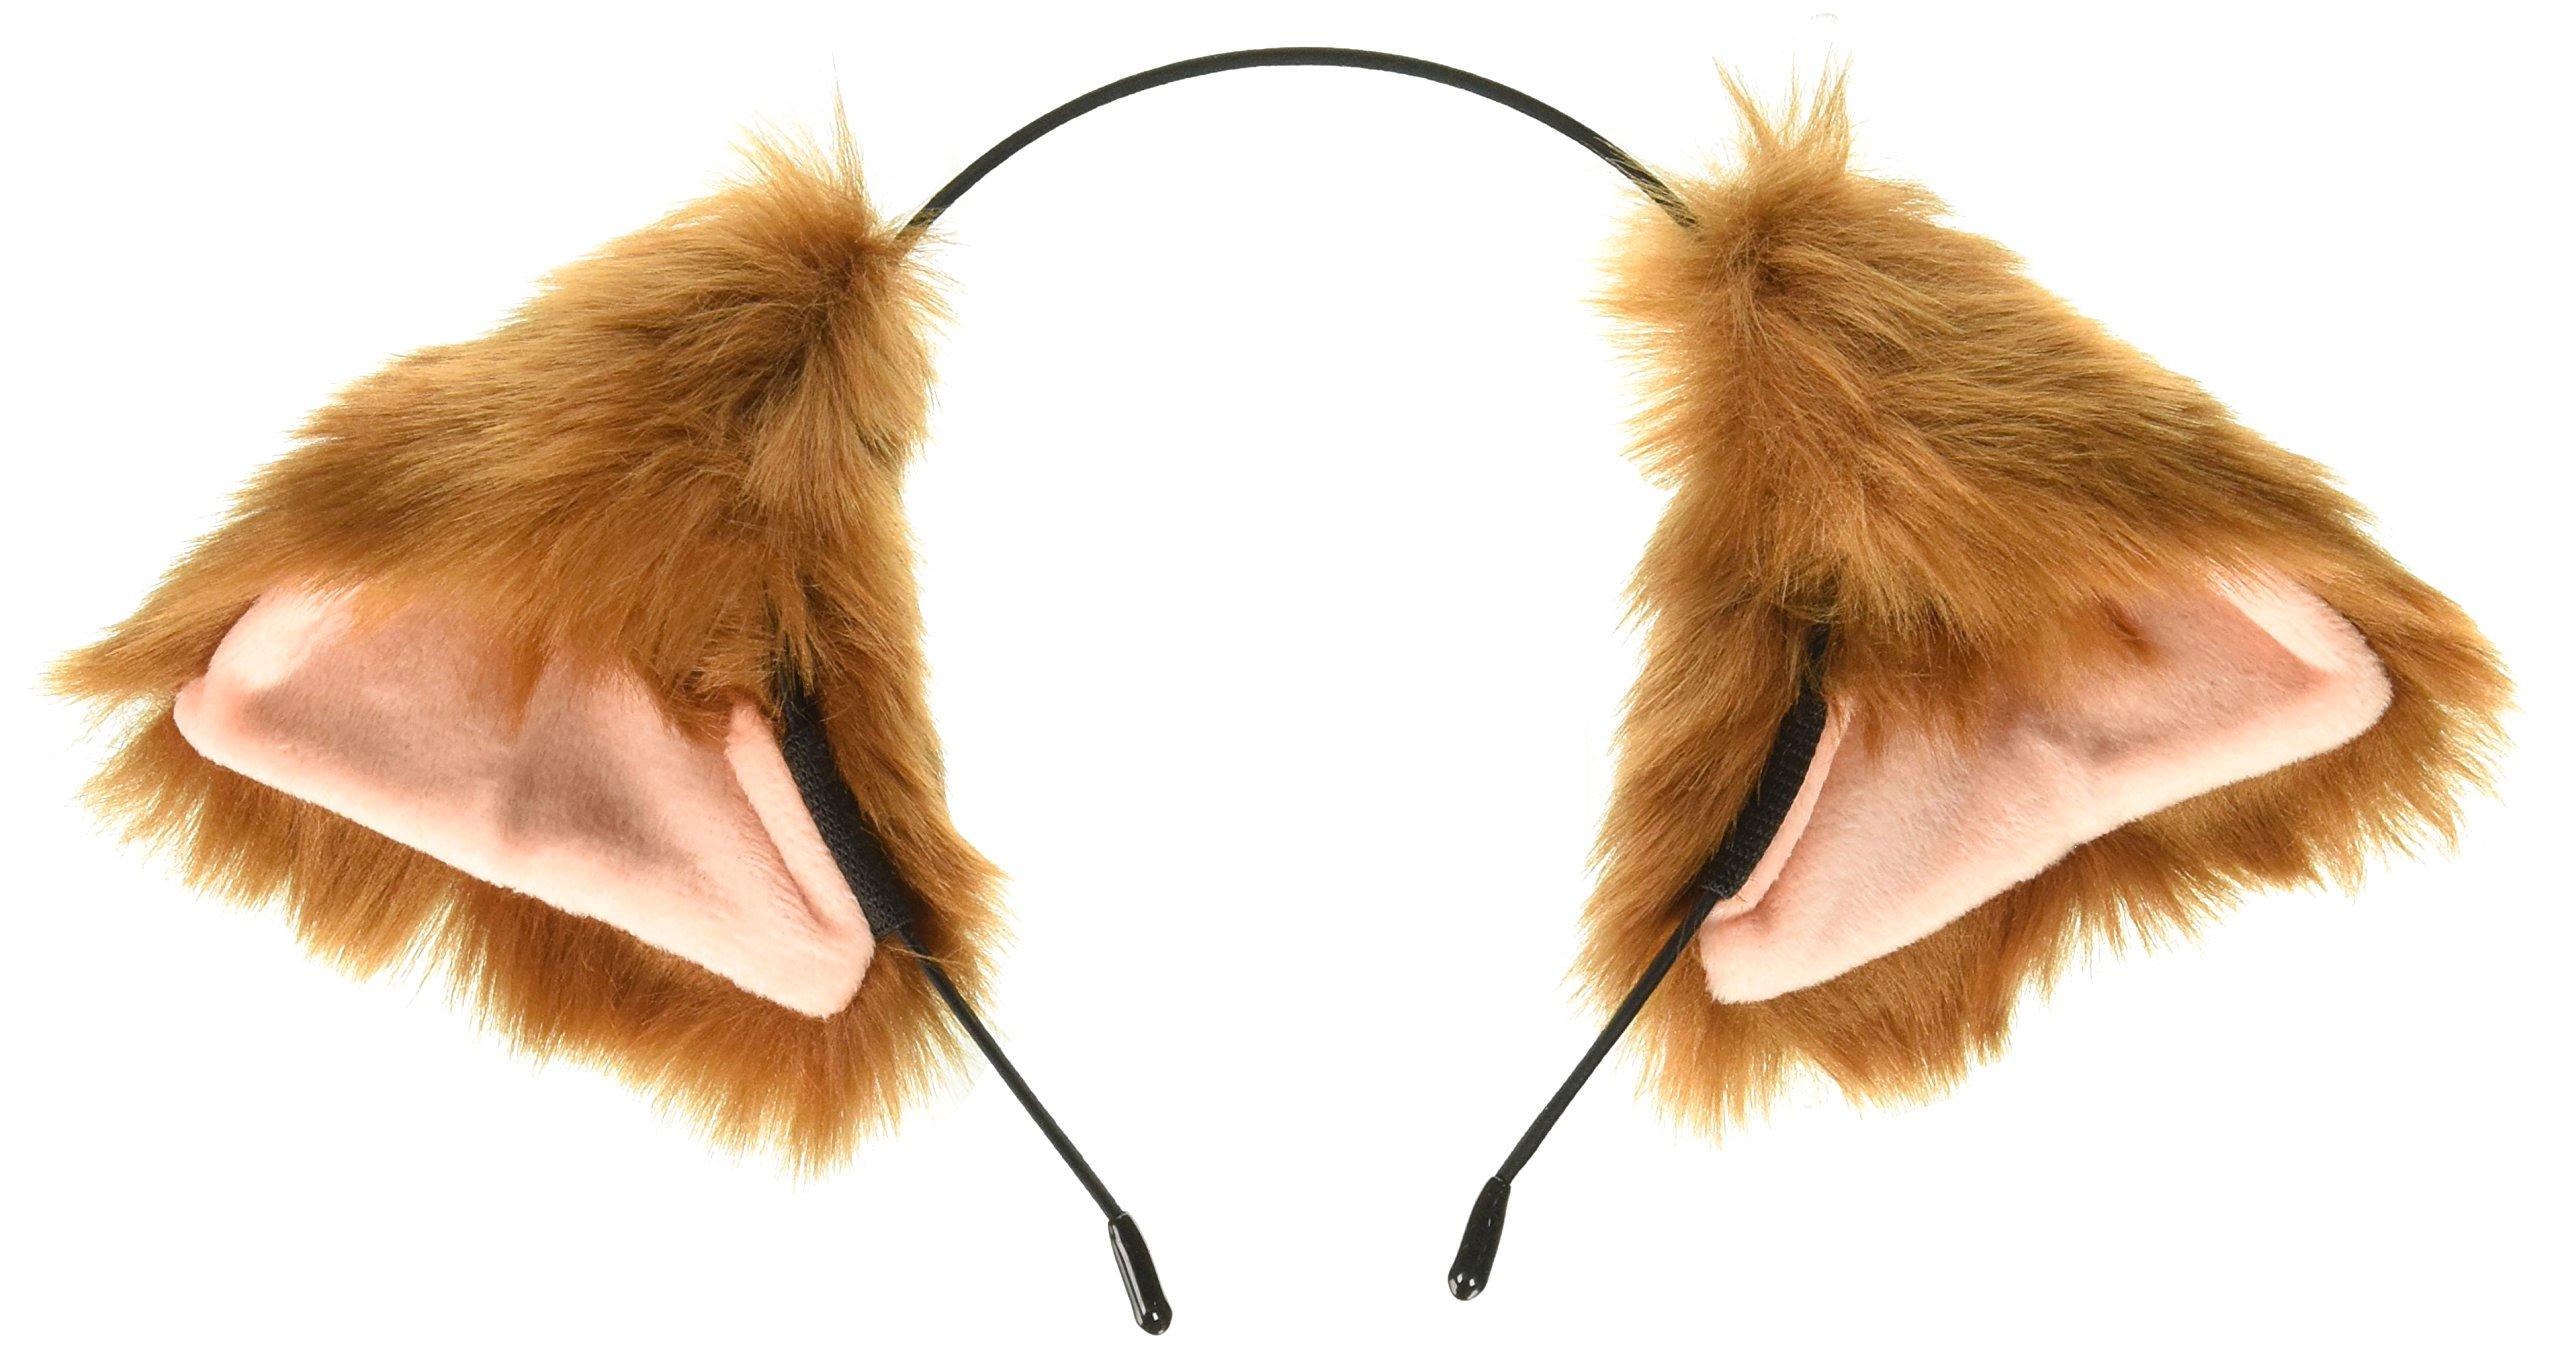 5054ff89b Cutegirl Cat Fox Ears Long Fur Hair Headband Anime Cosplay Party Costume  Brown and Champagne